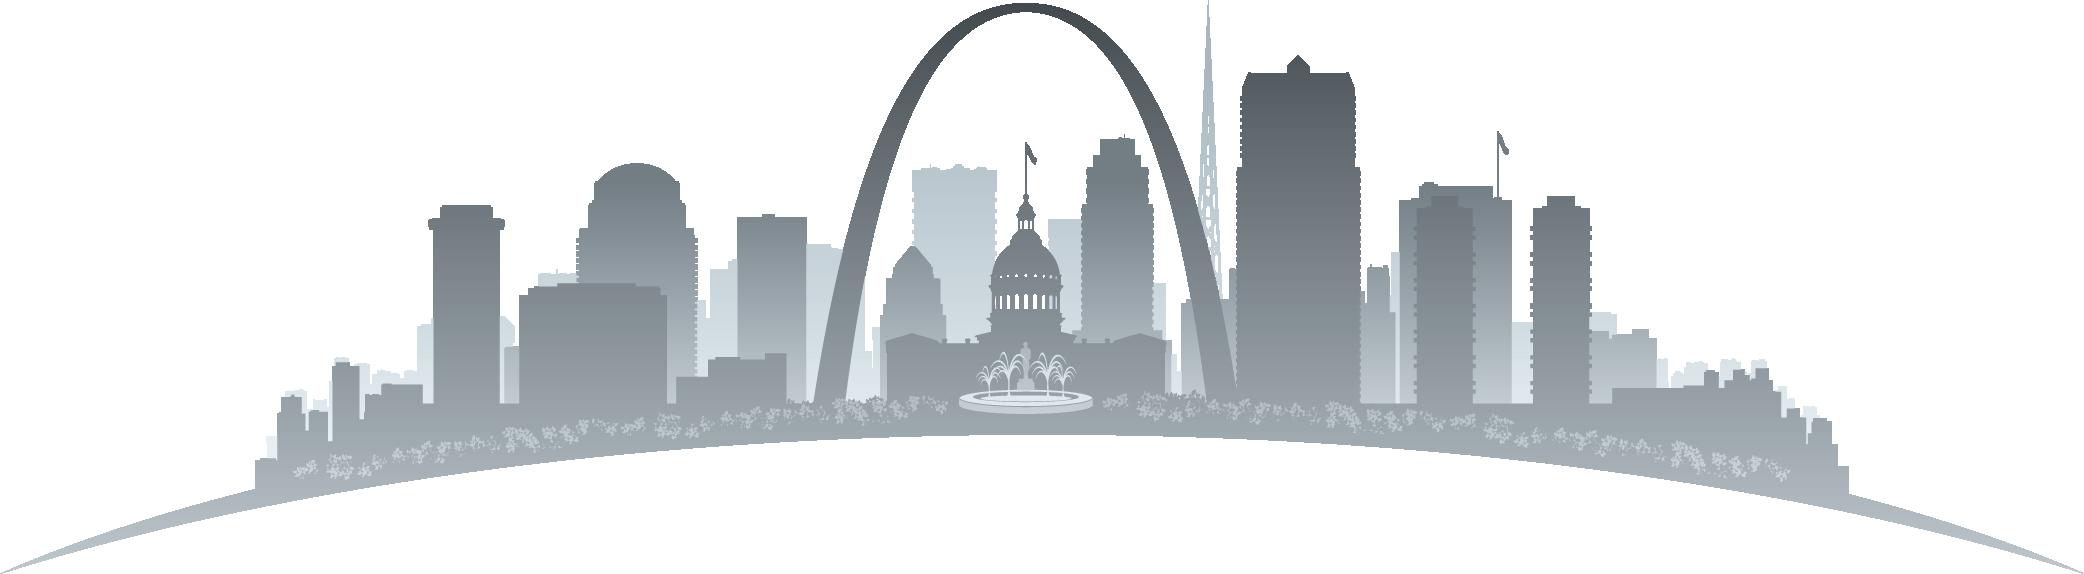 Test America - St. Louis, Missouri